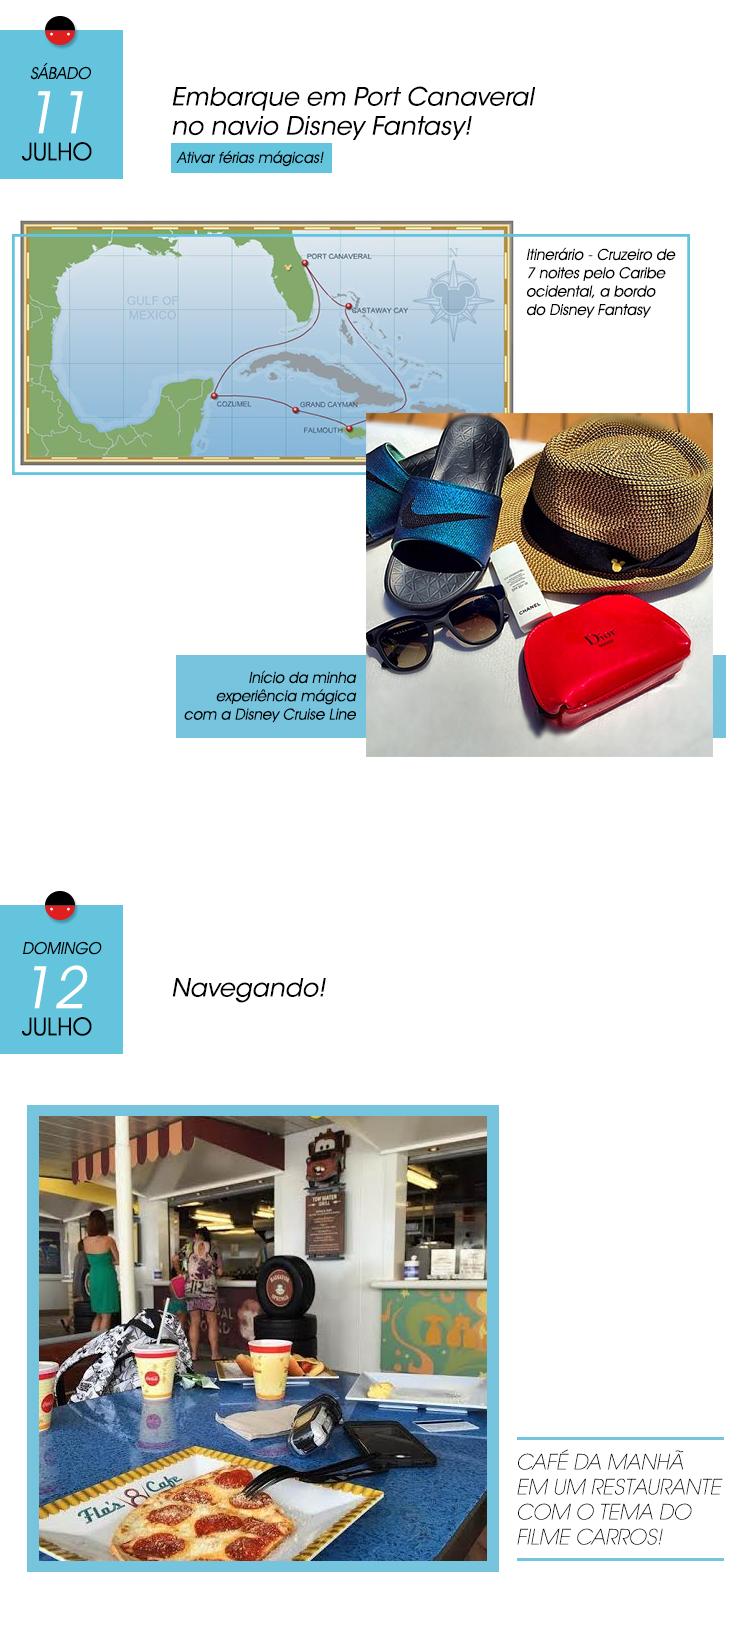 150713.BlogVolare_RoteiroDisneyFantasyCruiseShip_02